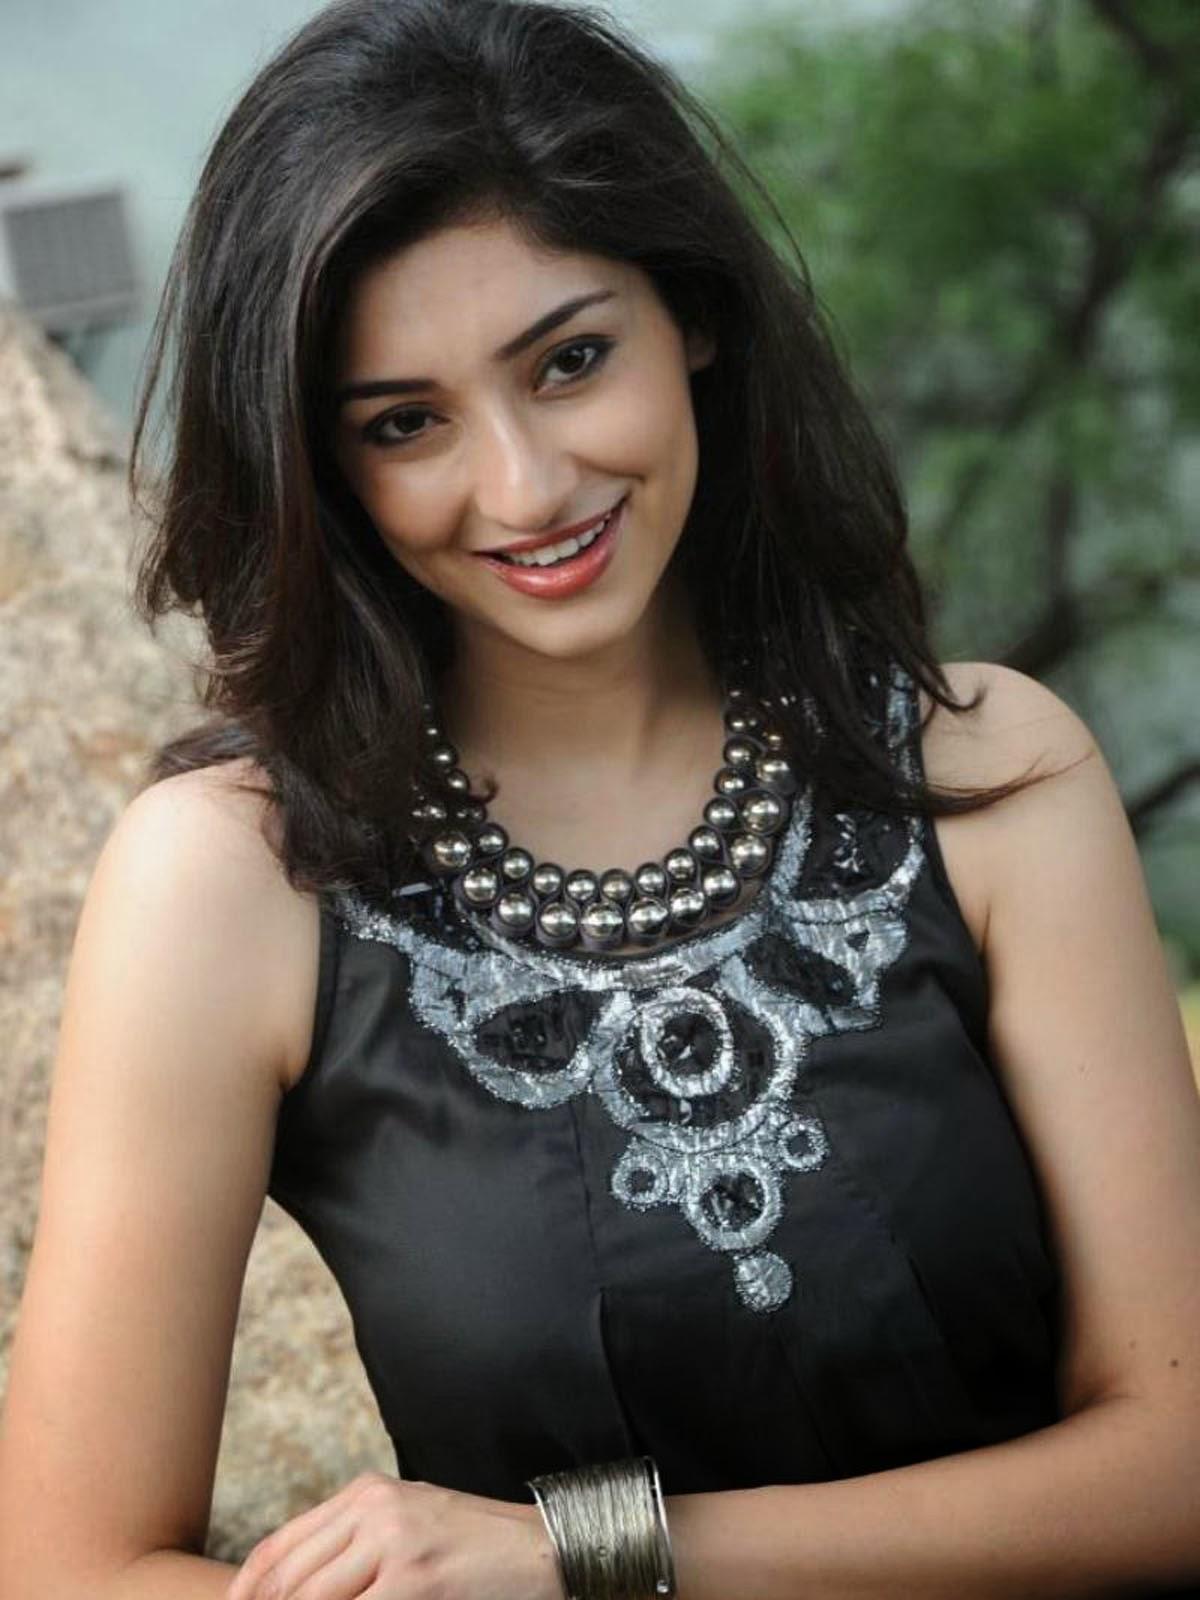 Pin Actress Tanvi Vyas Latest Hot Photos on Pinterest